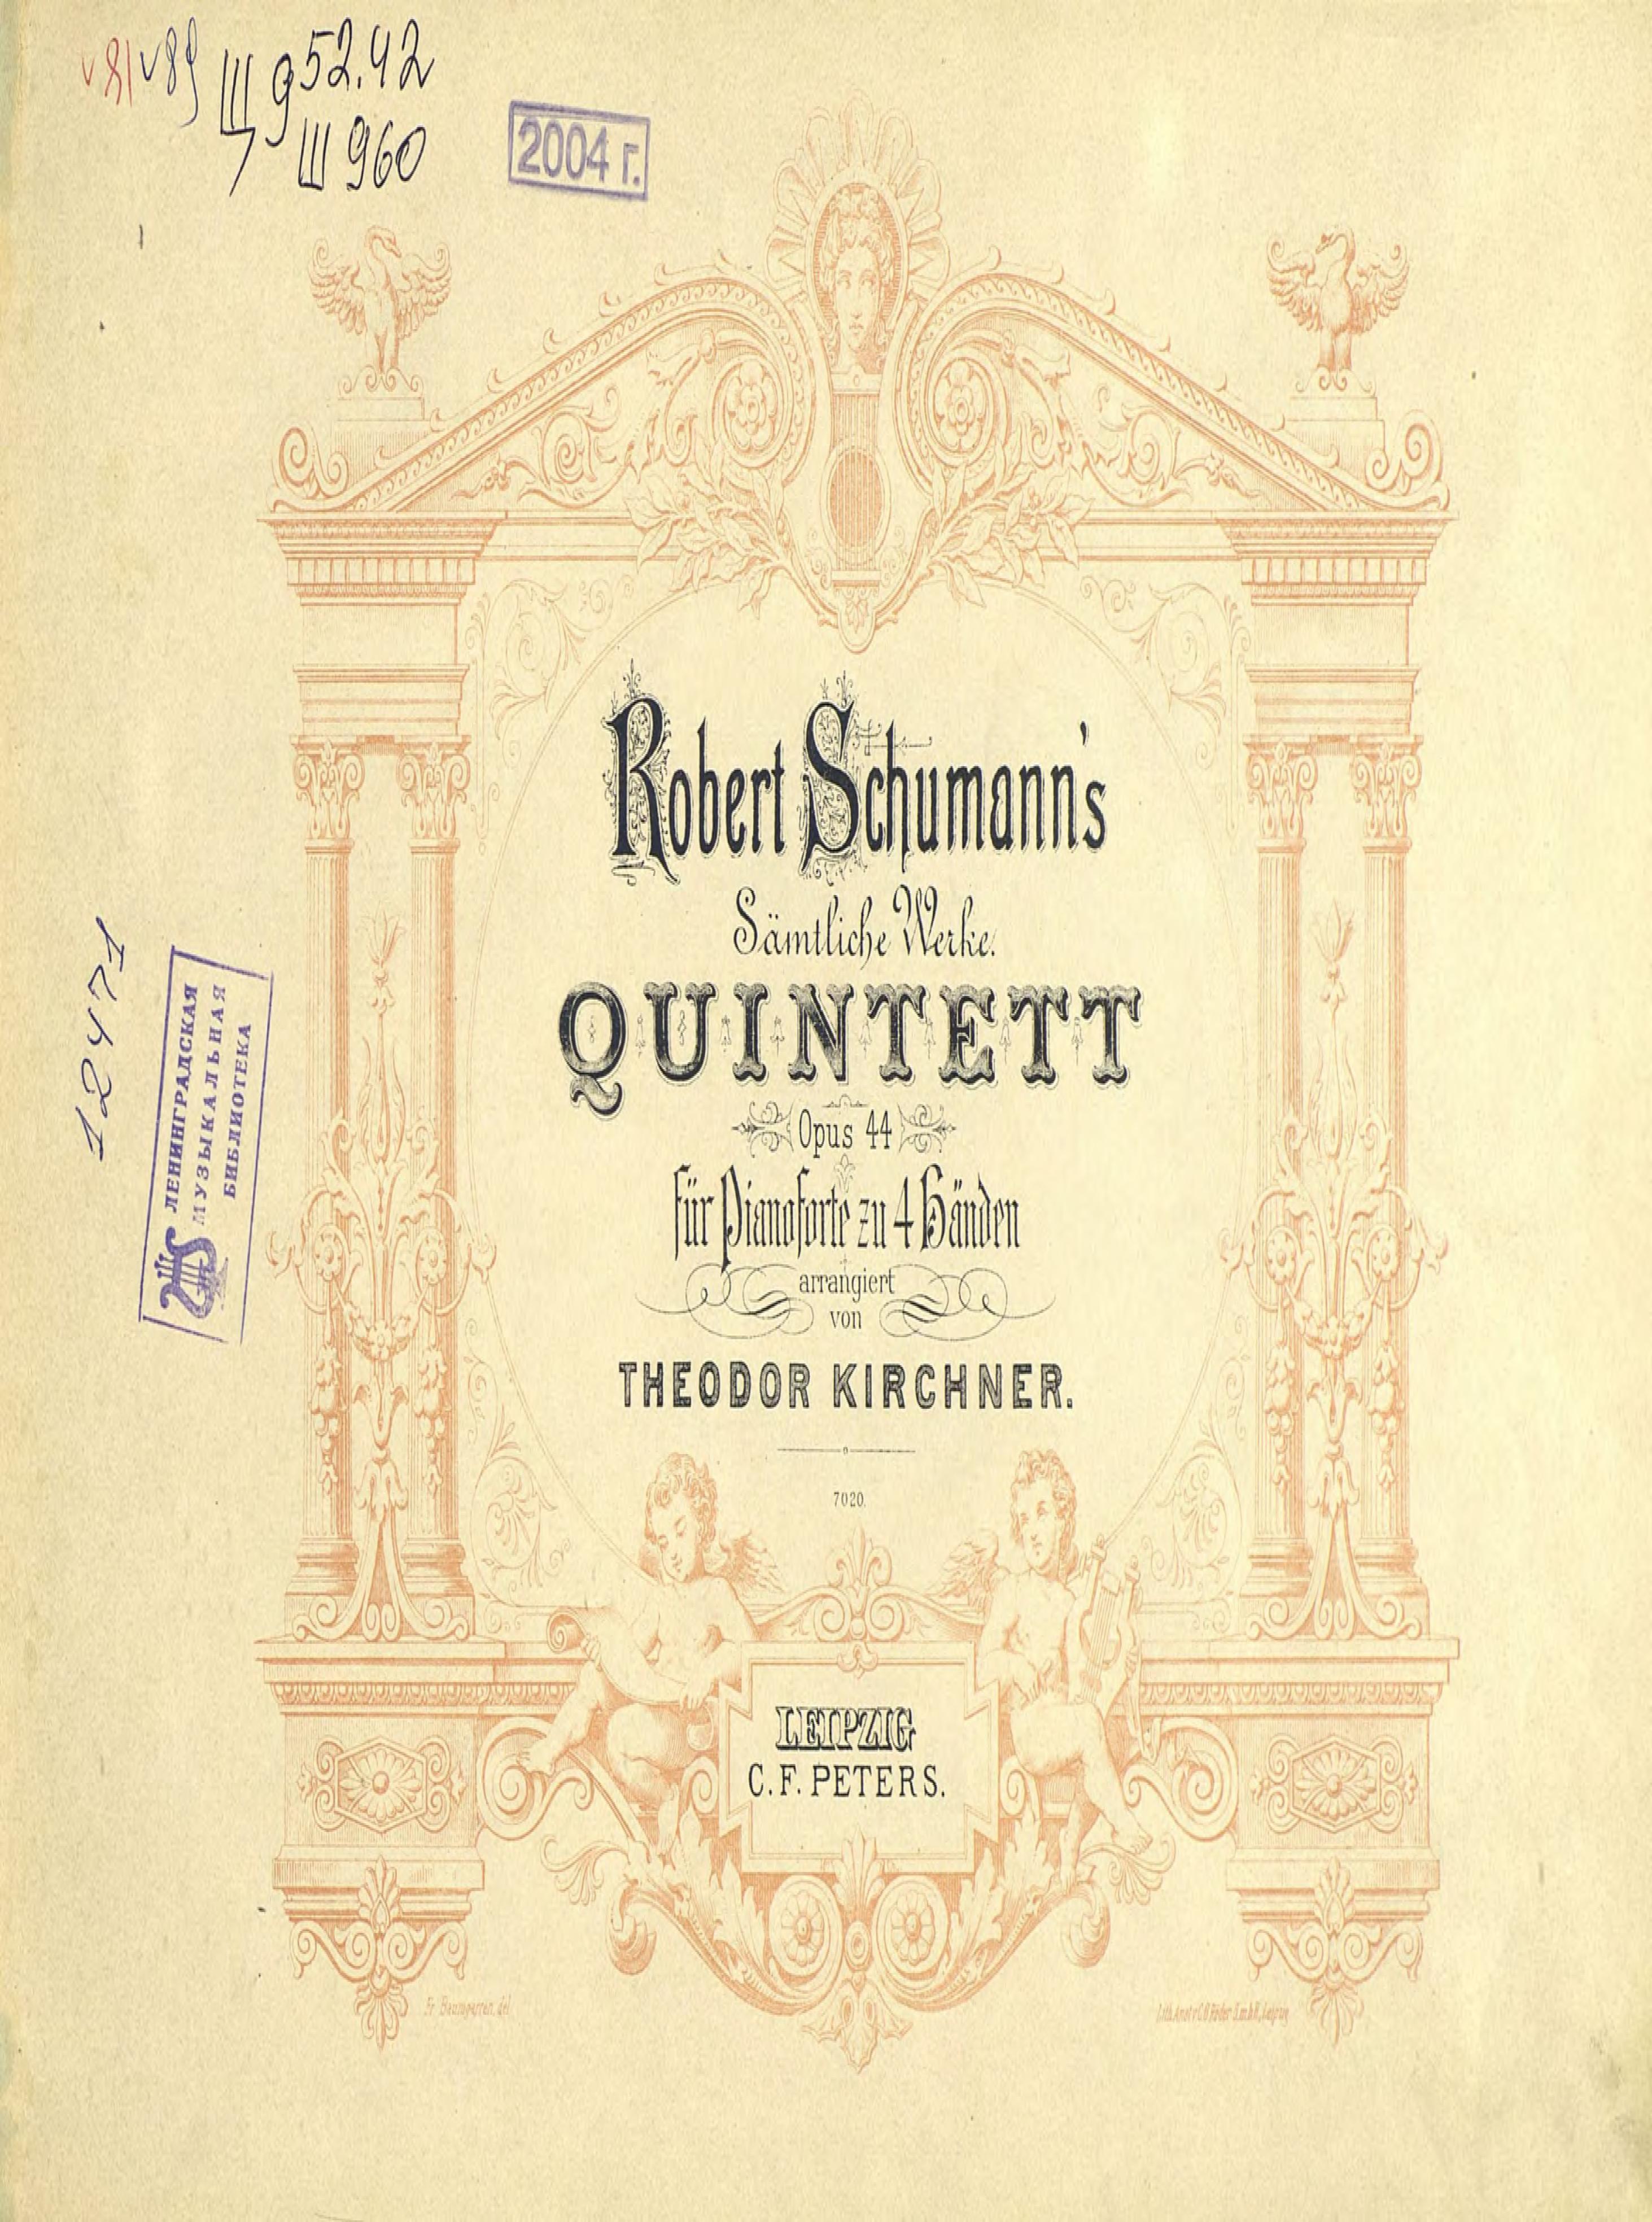 Роберт Шуман Quintett fur Pianoforte zu 4 Handen роберт шуман quintett